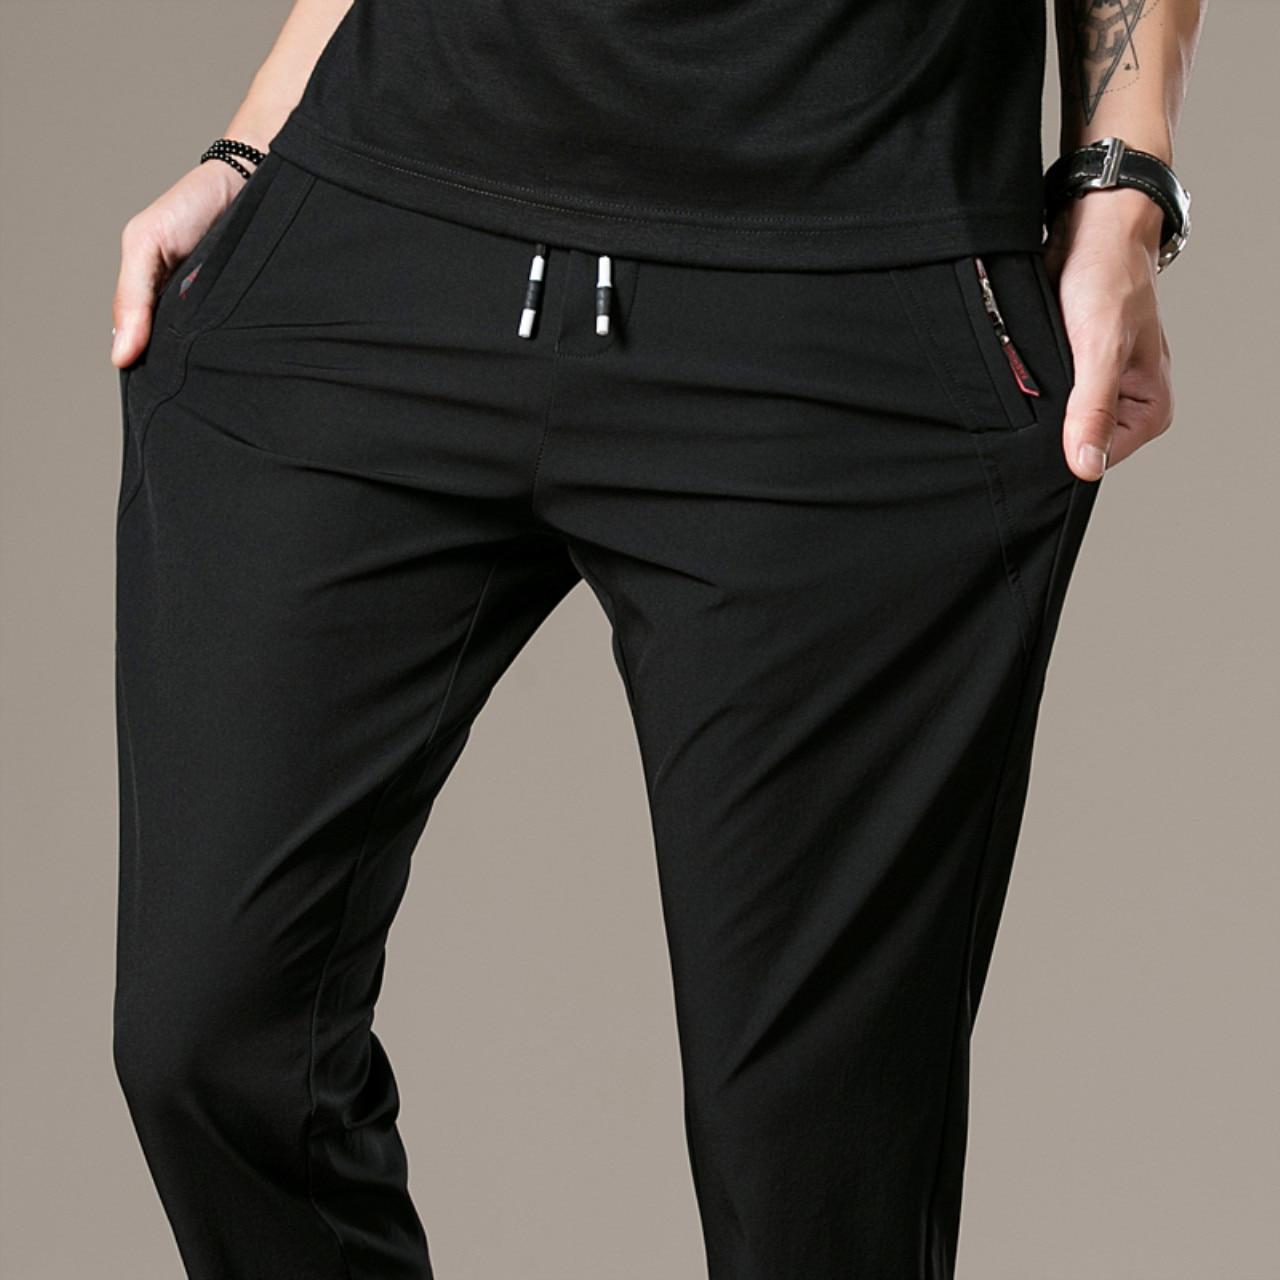 Long-Pants Winter Casual Fashion New Cheap Autumn Popular MC126 Hot-Selling Men's Wholesale